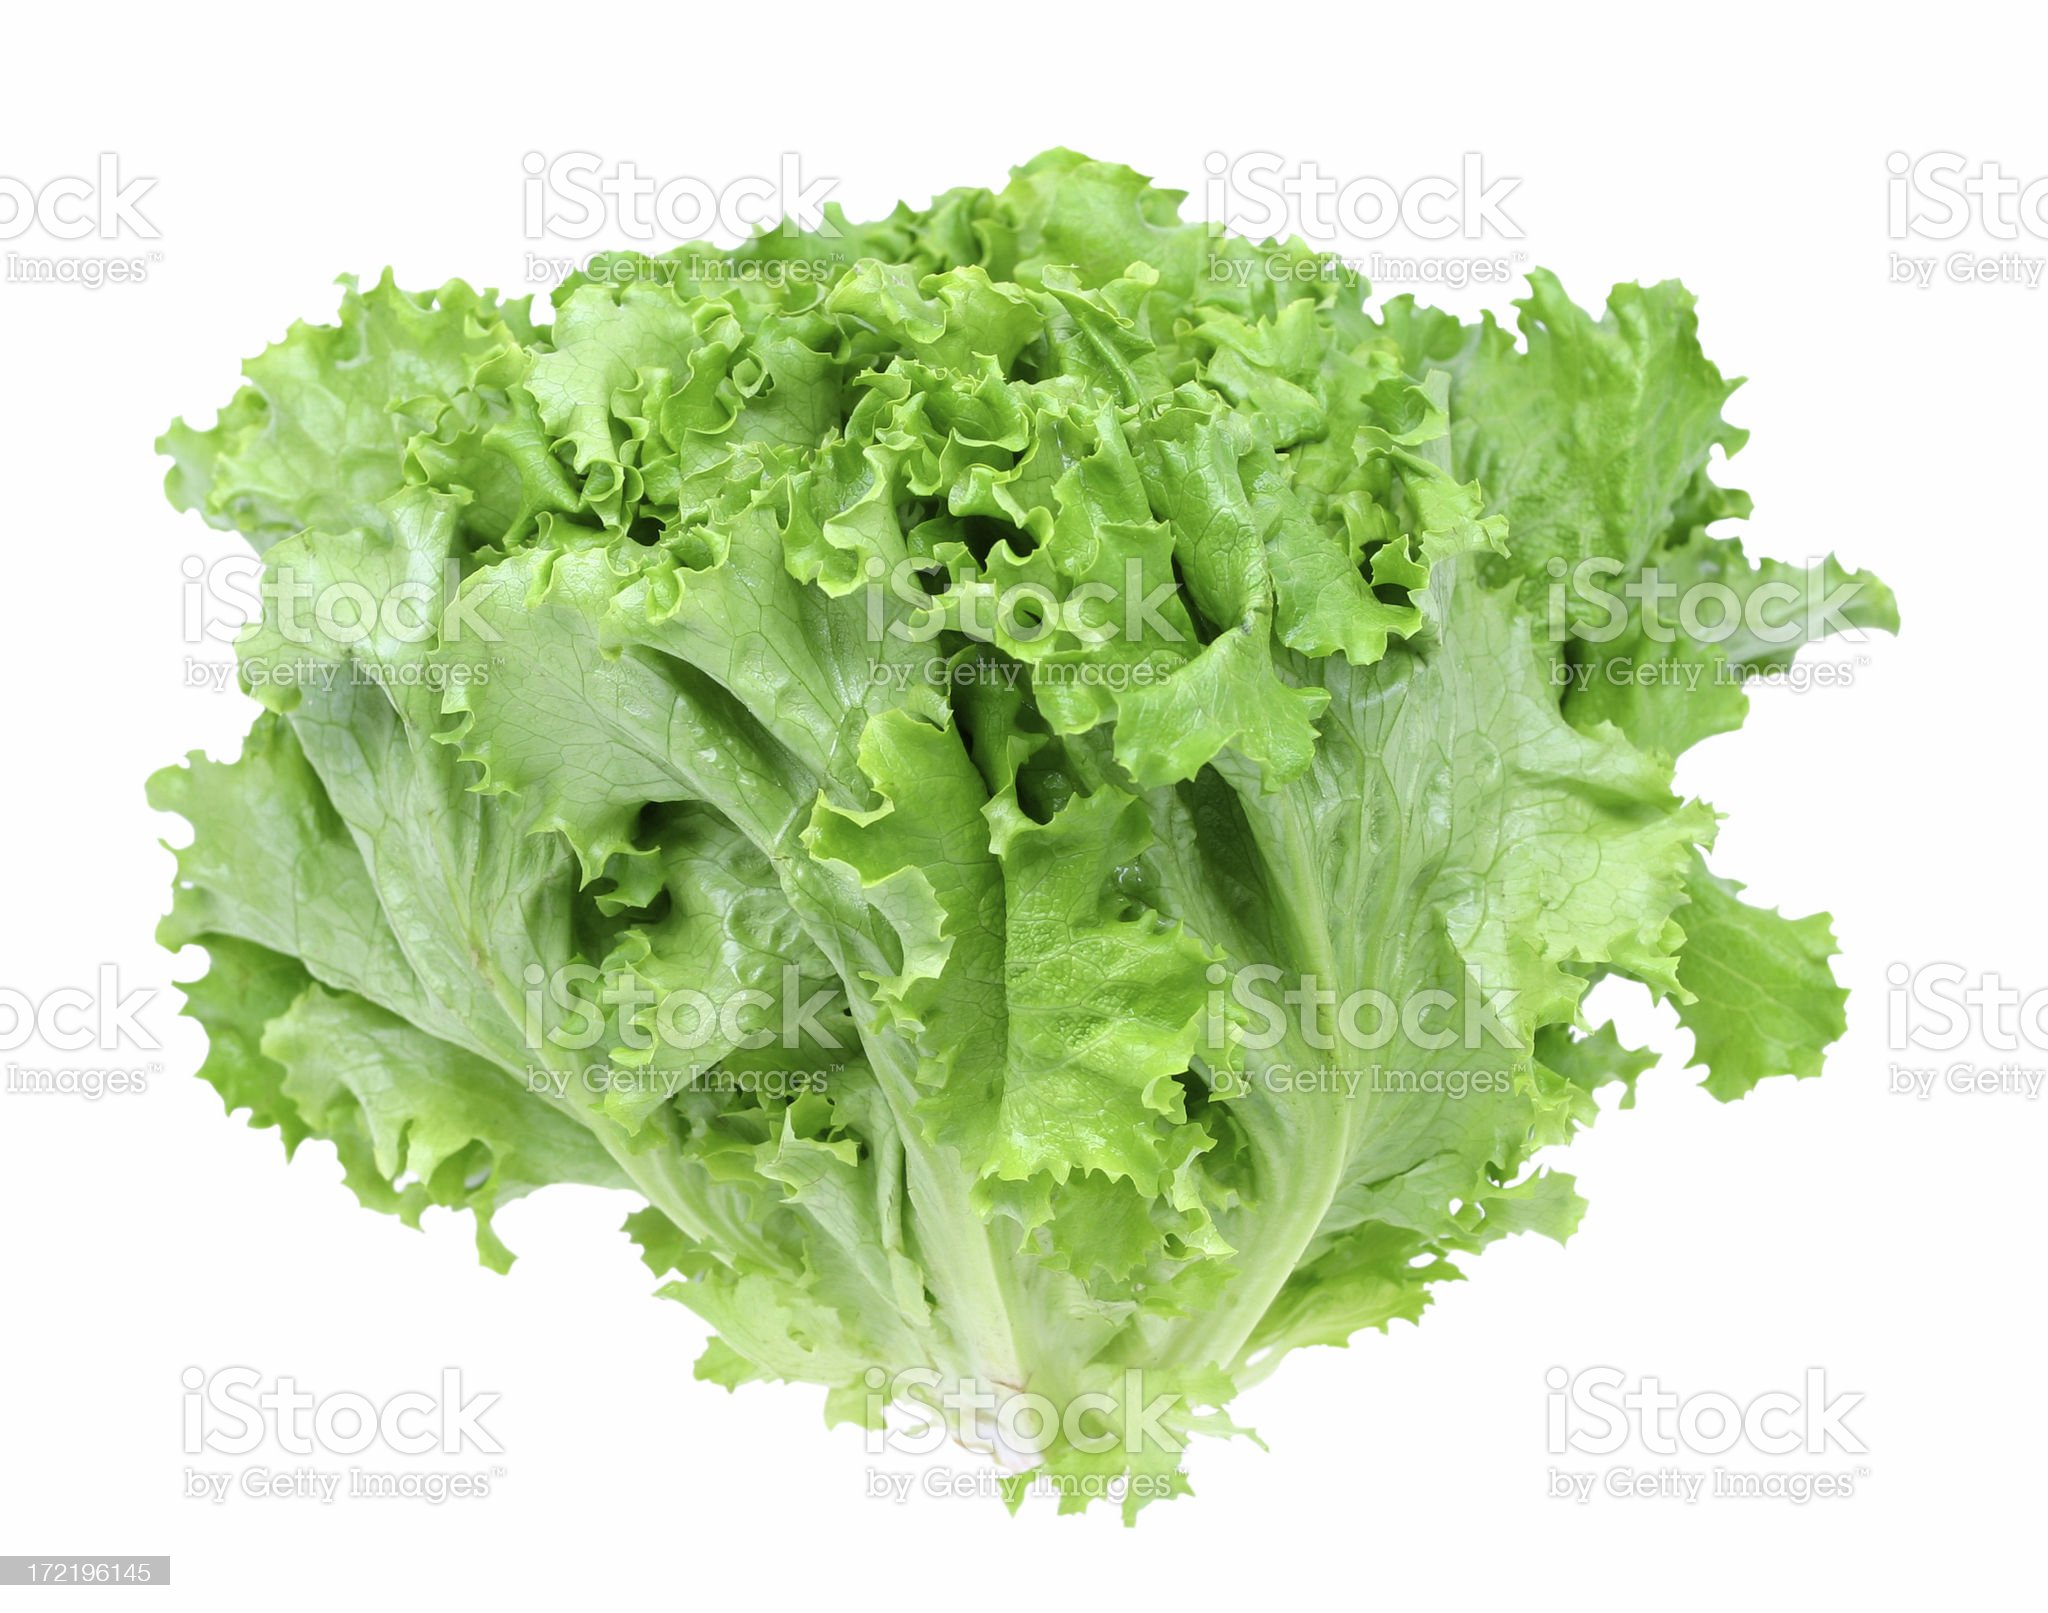 green leaf lettuce royalty-free stock photo